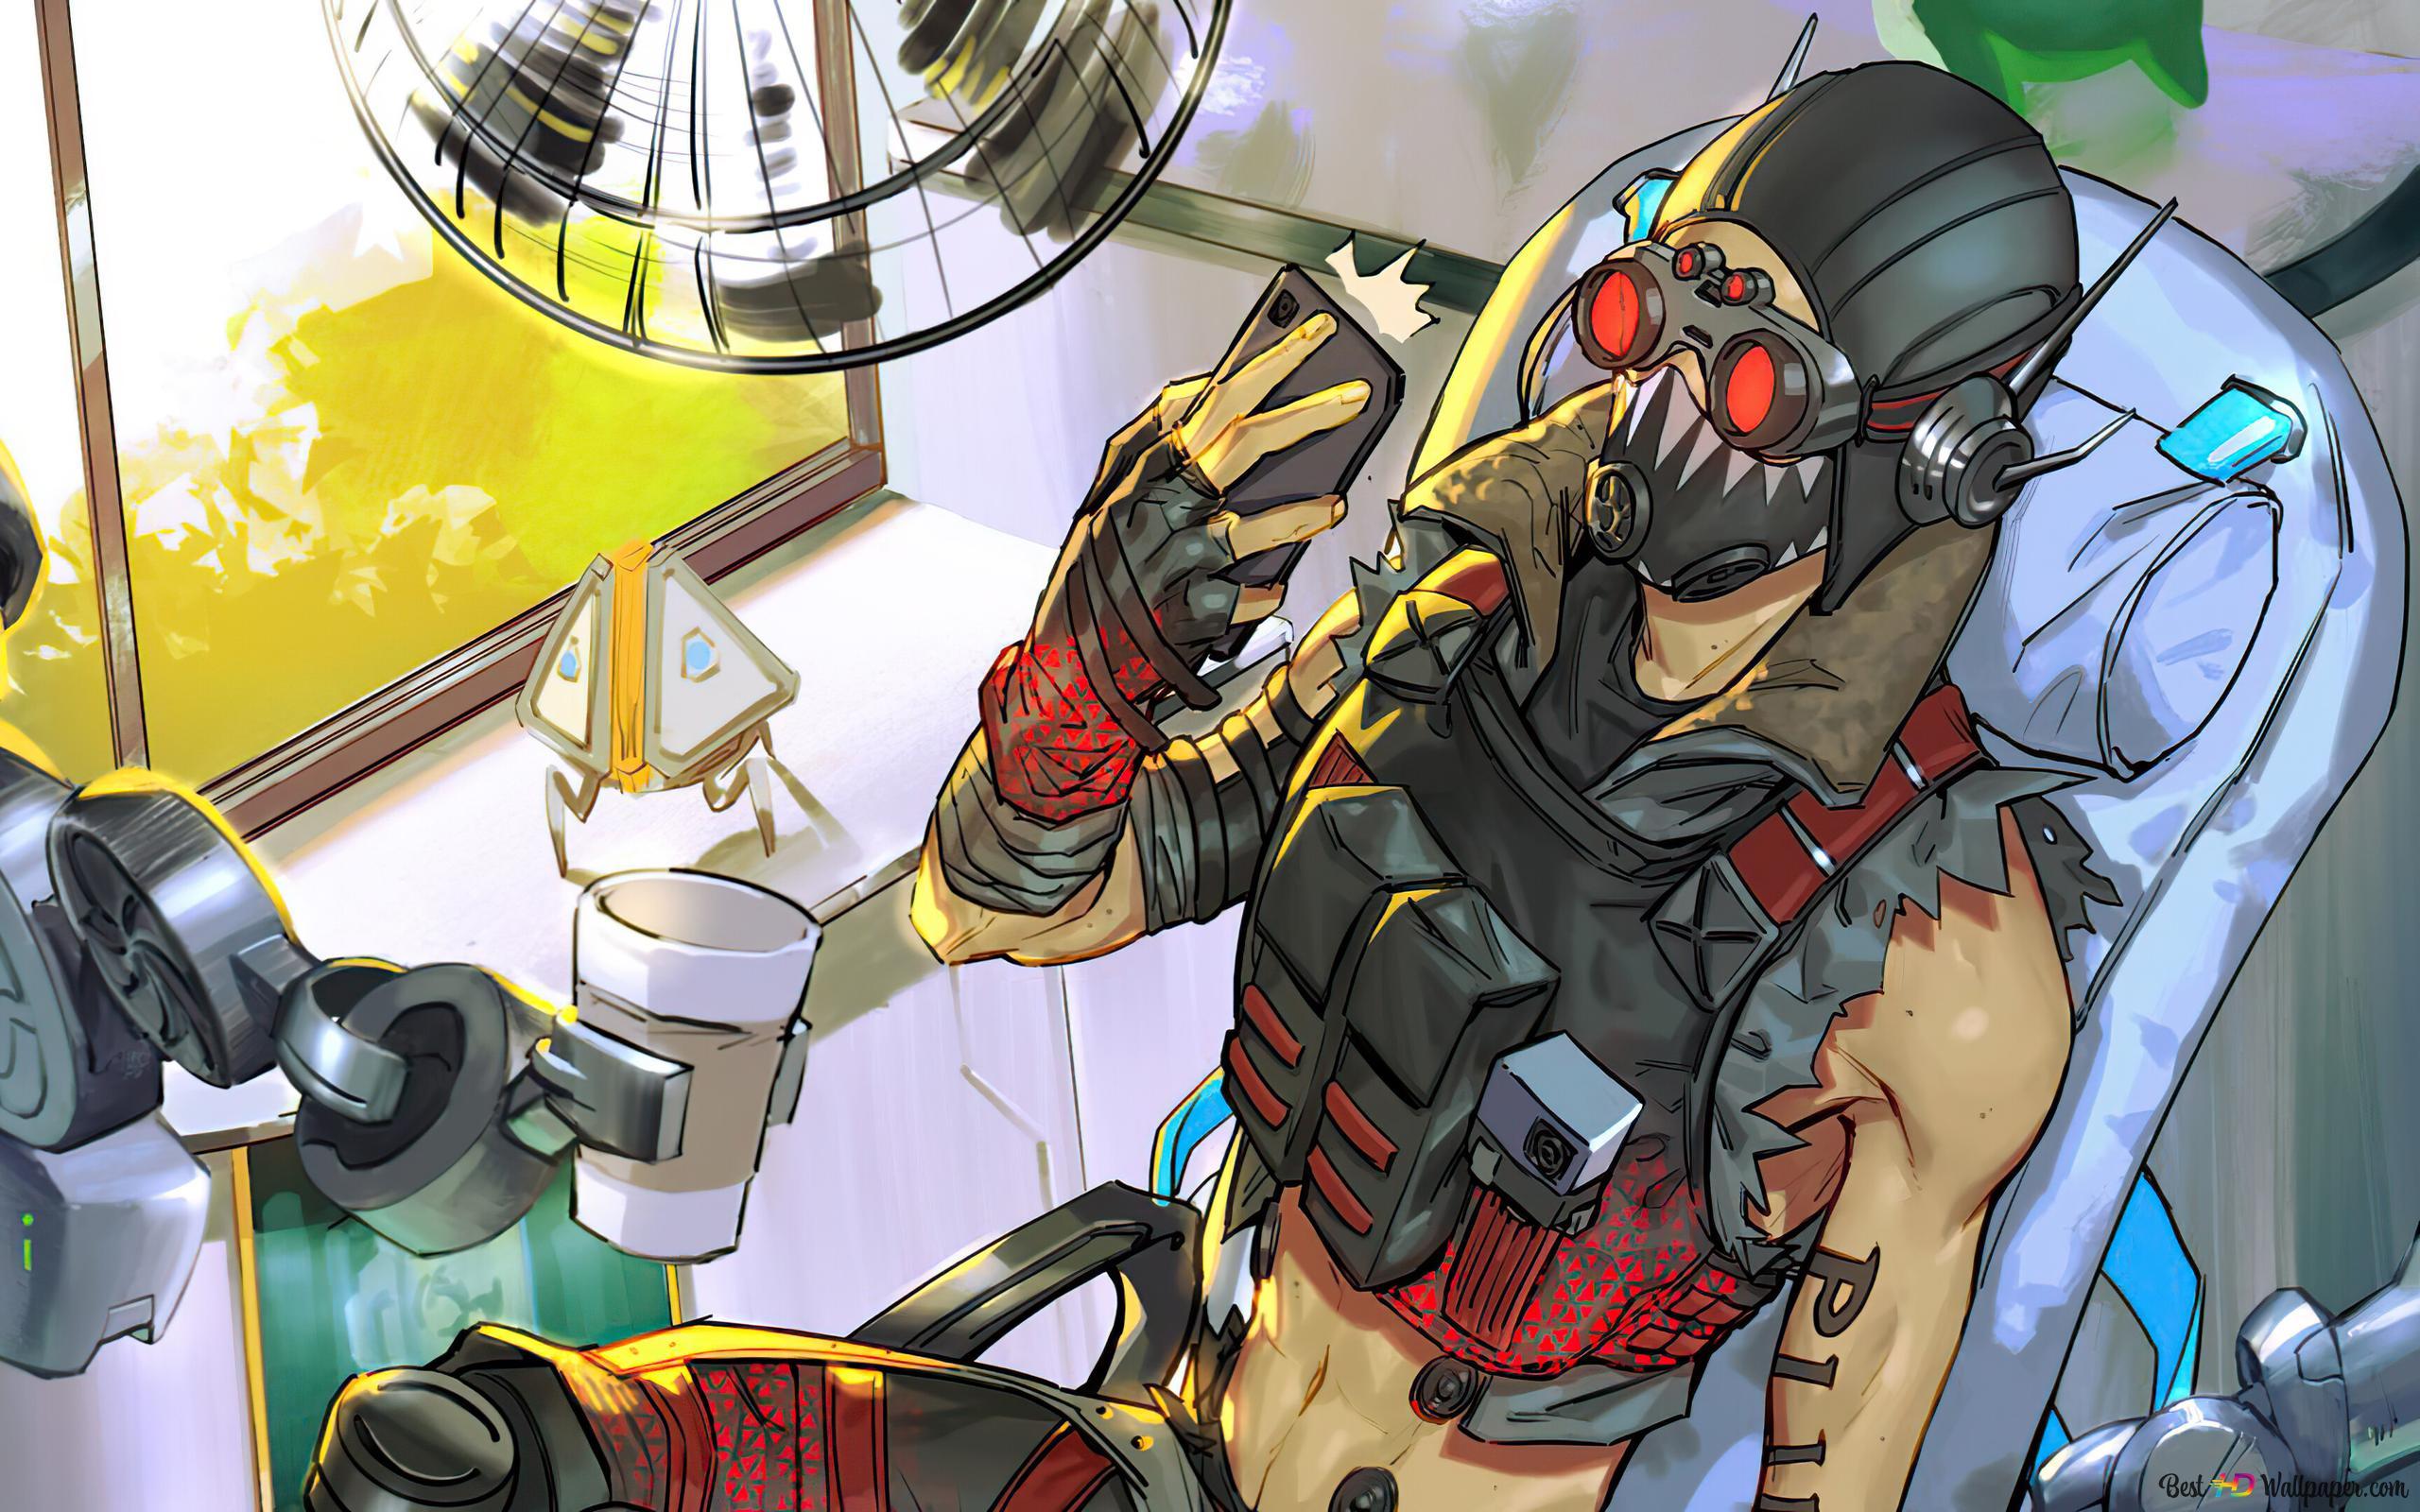 Selfie 'Octane' (Comics Art) - Apex Legends (videogioco) Download di sfondi  HD